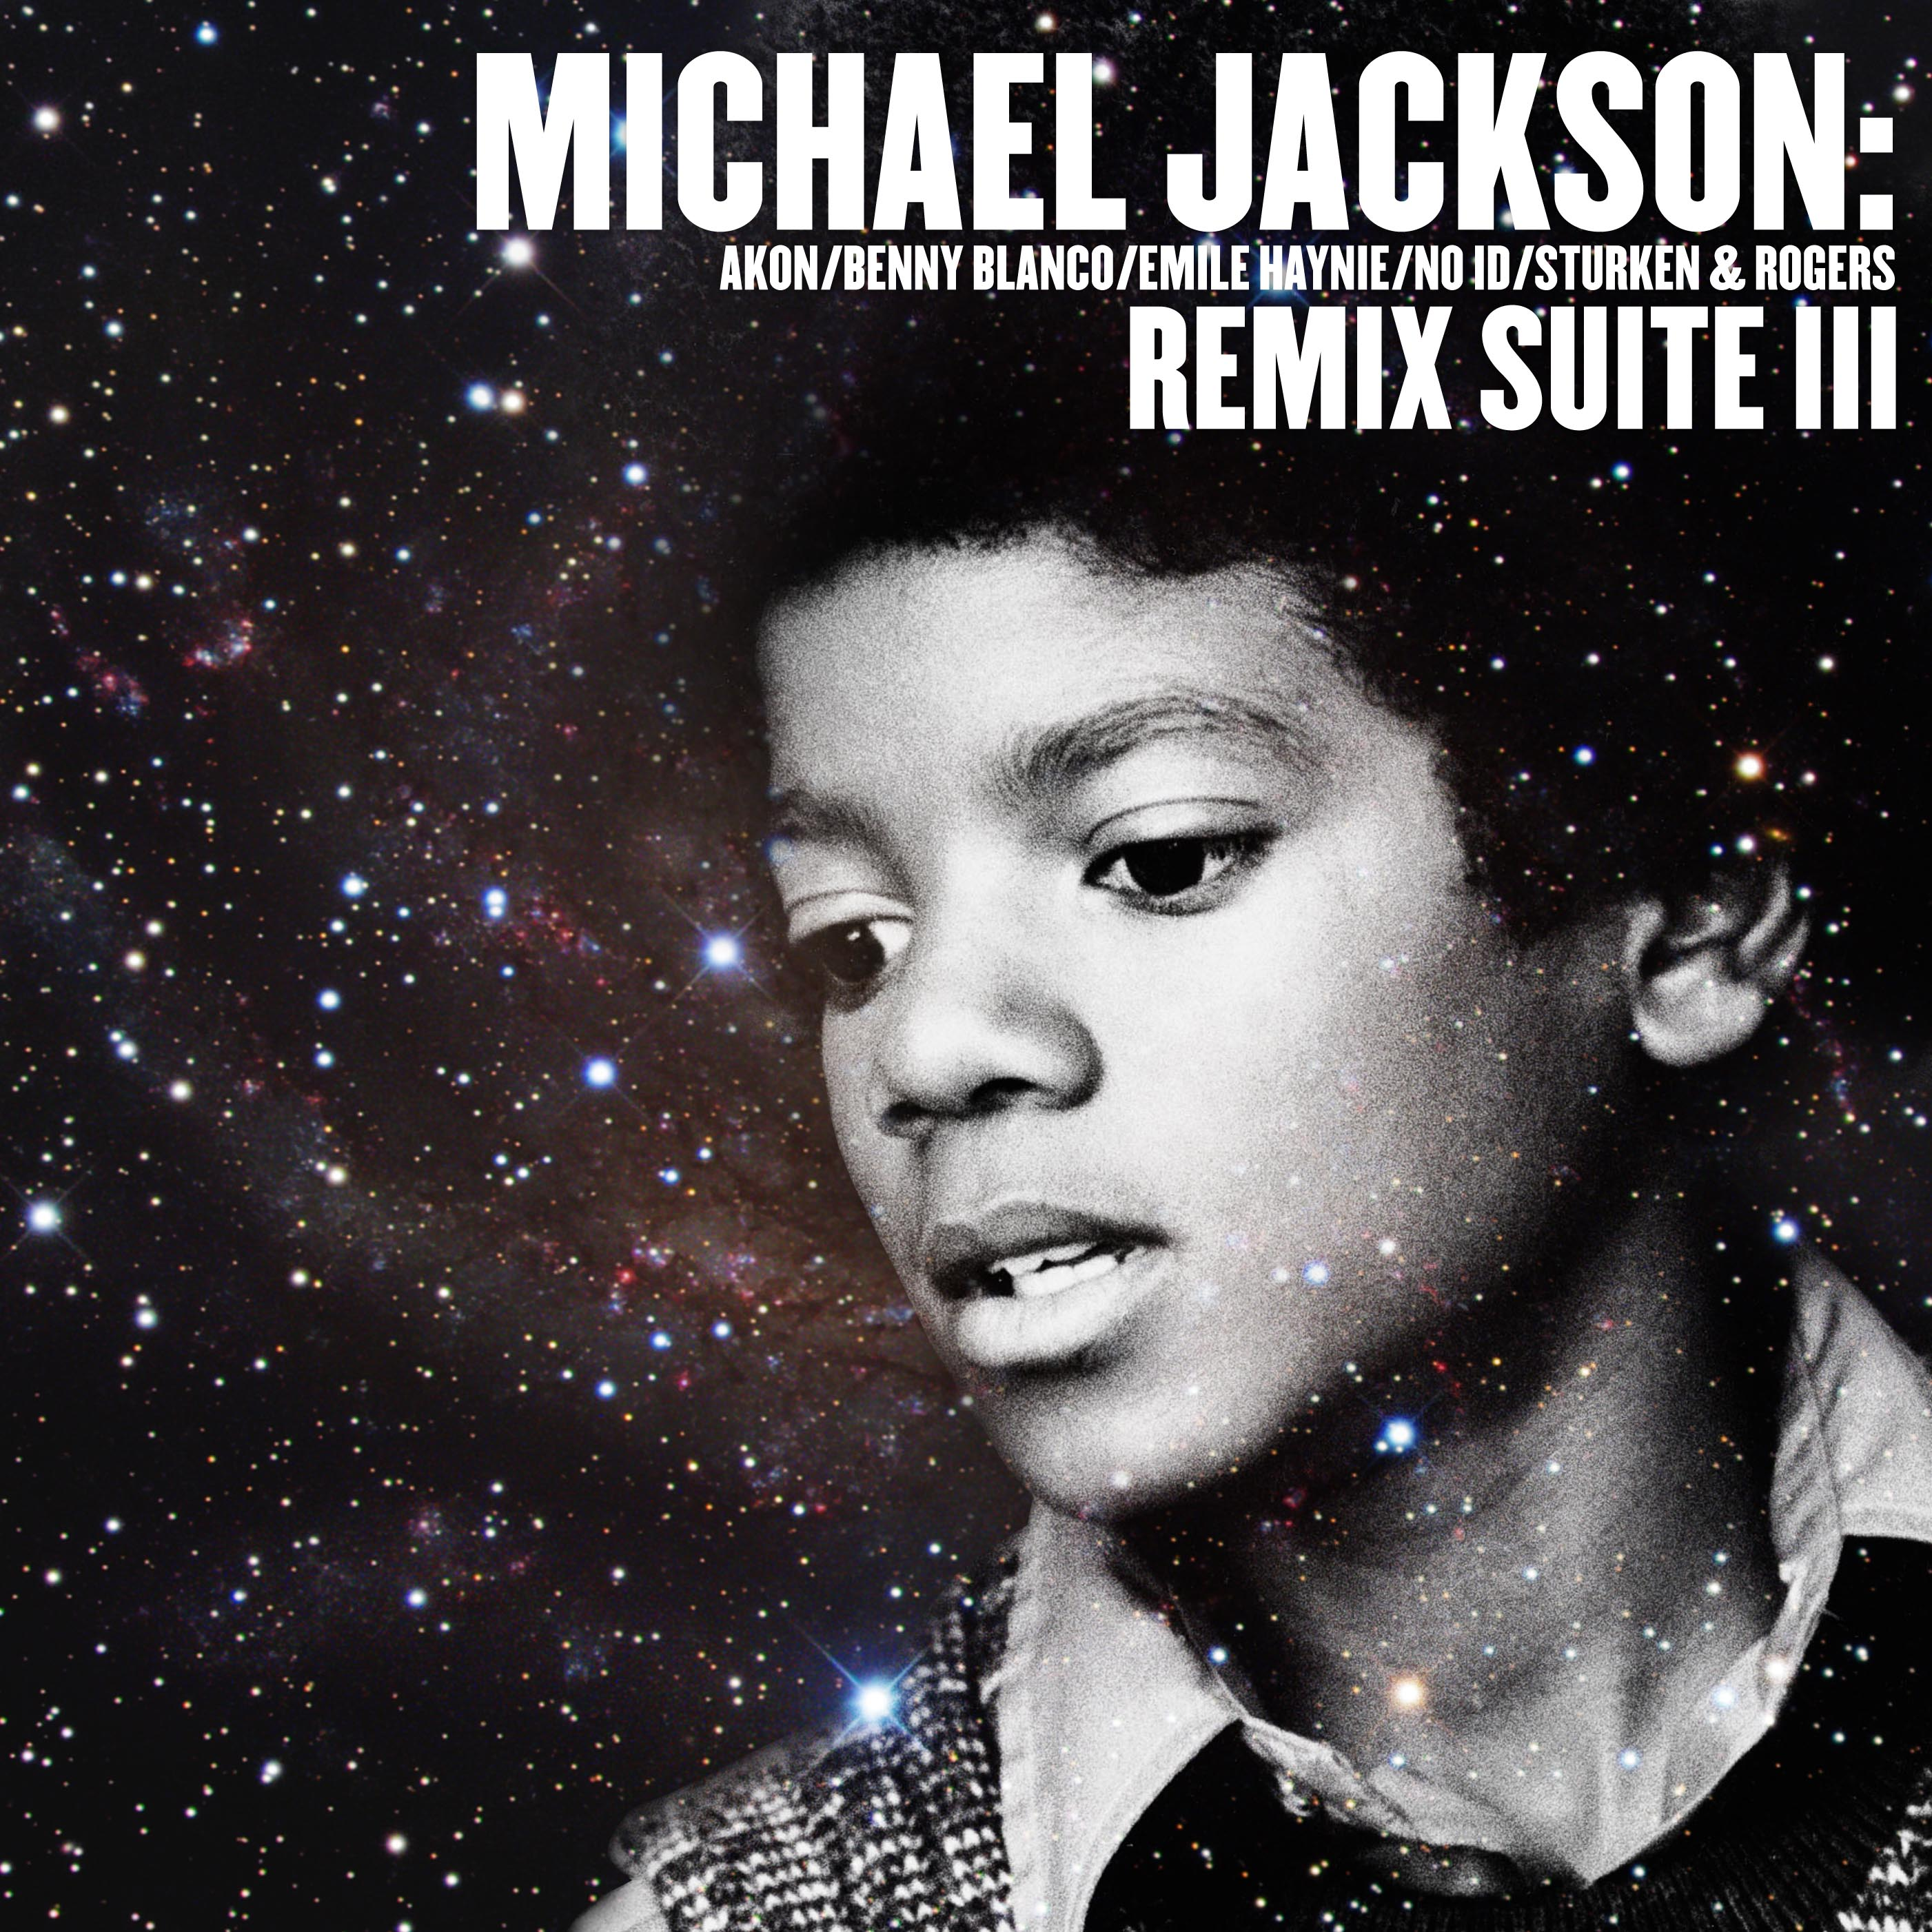 MJ Remix Cover 3